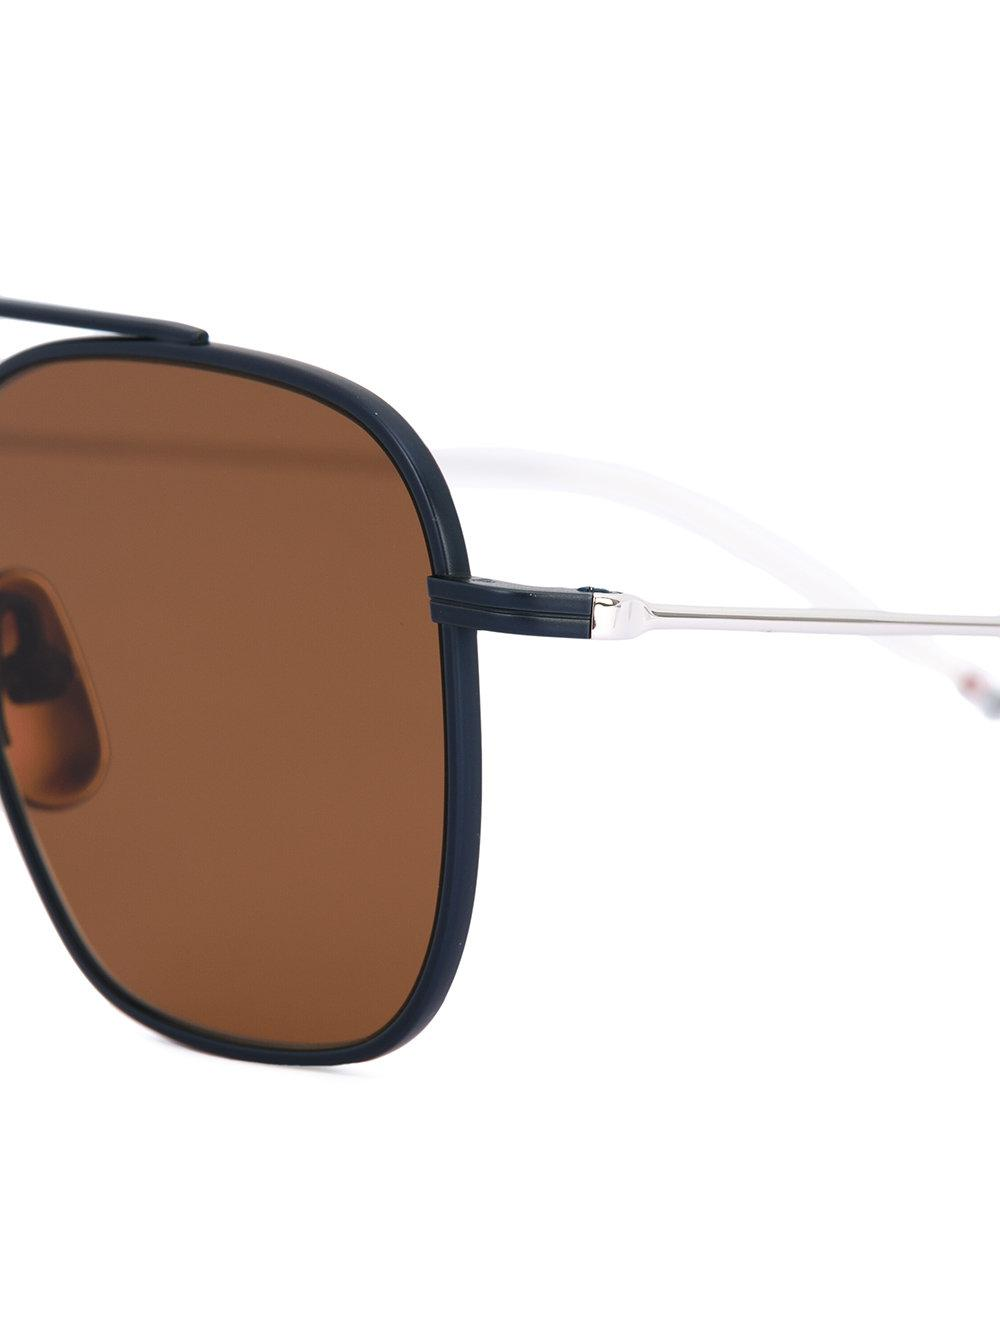 Thom Browne Tbs907 Sunglasses in Blue